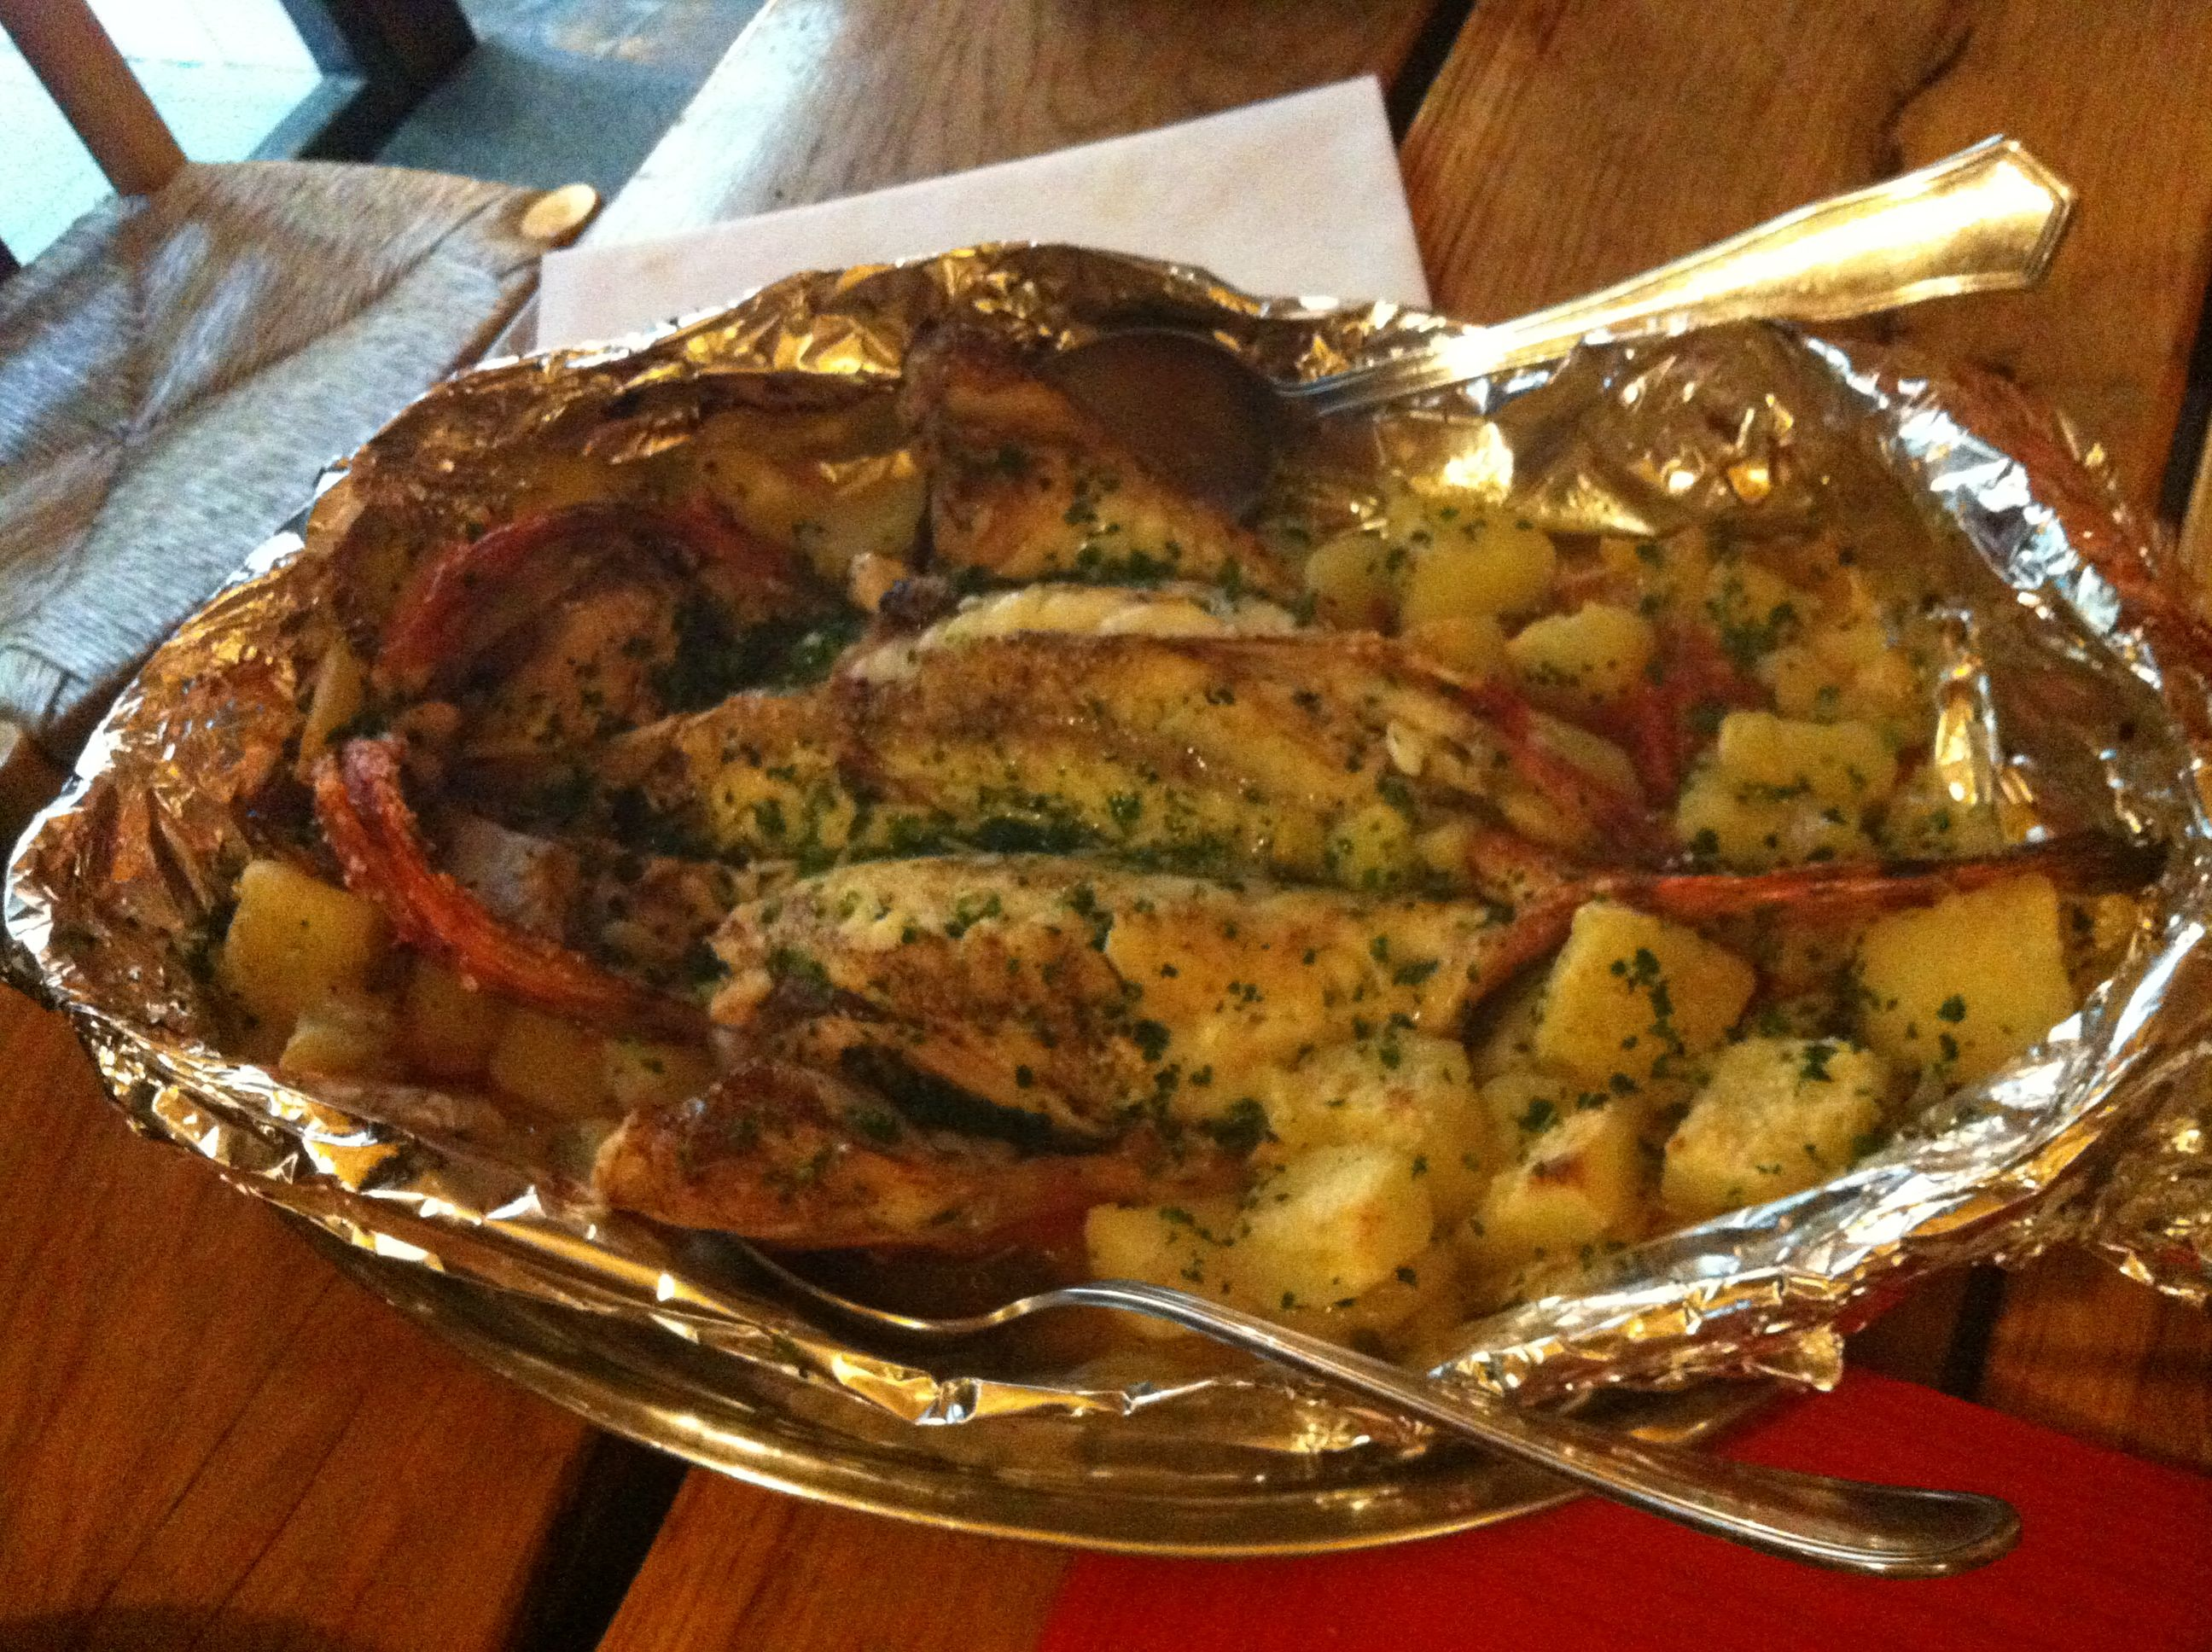 Cabracho al horno de le a casa juanita restaurantes pinterest - Restaurant casa juanita ...